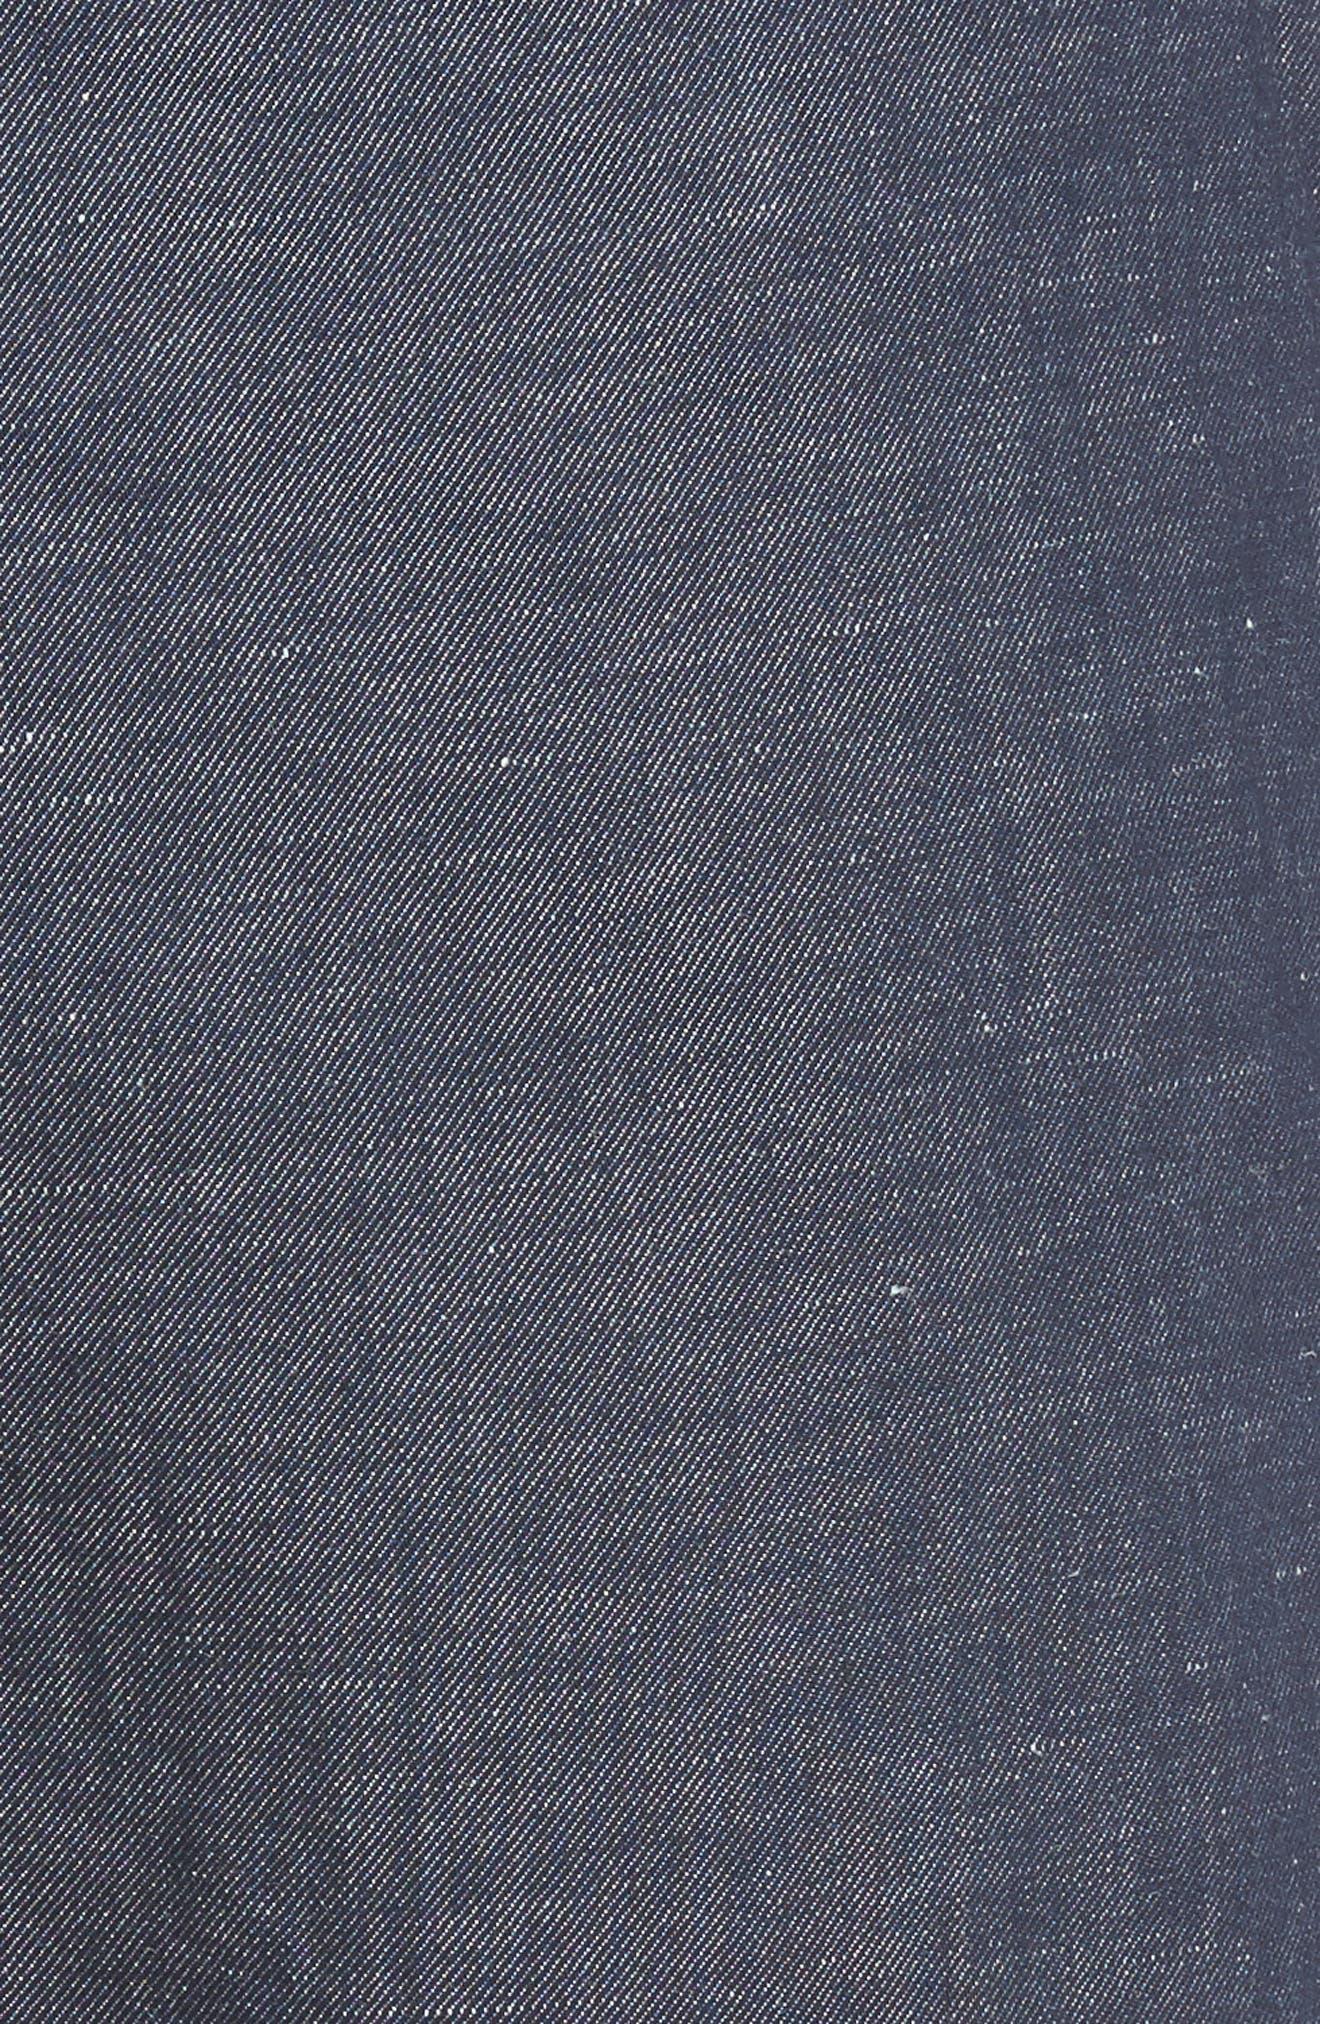 Frisho Cuff Denim Shorts,                             Alternate thumbnail 10, color,